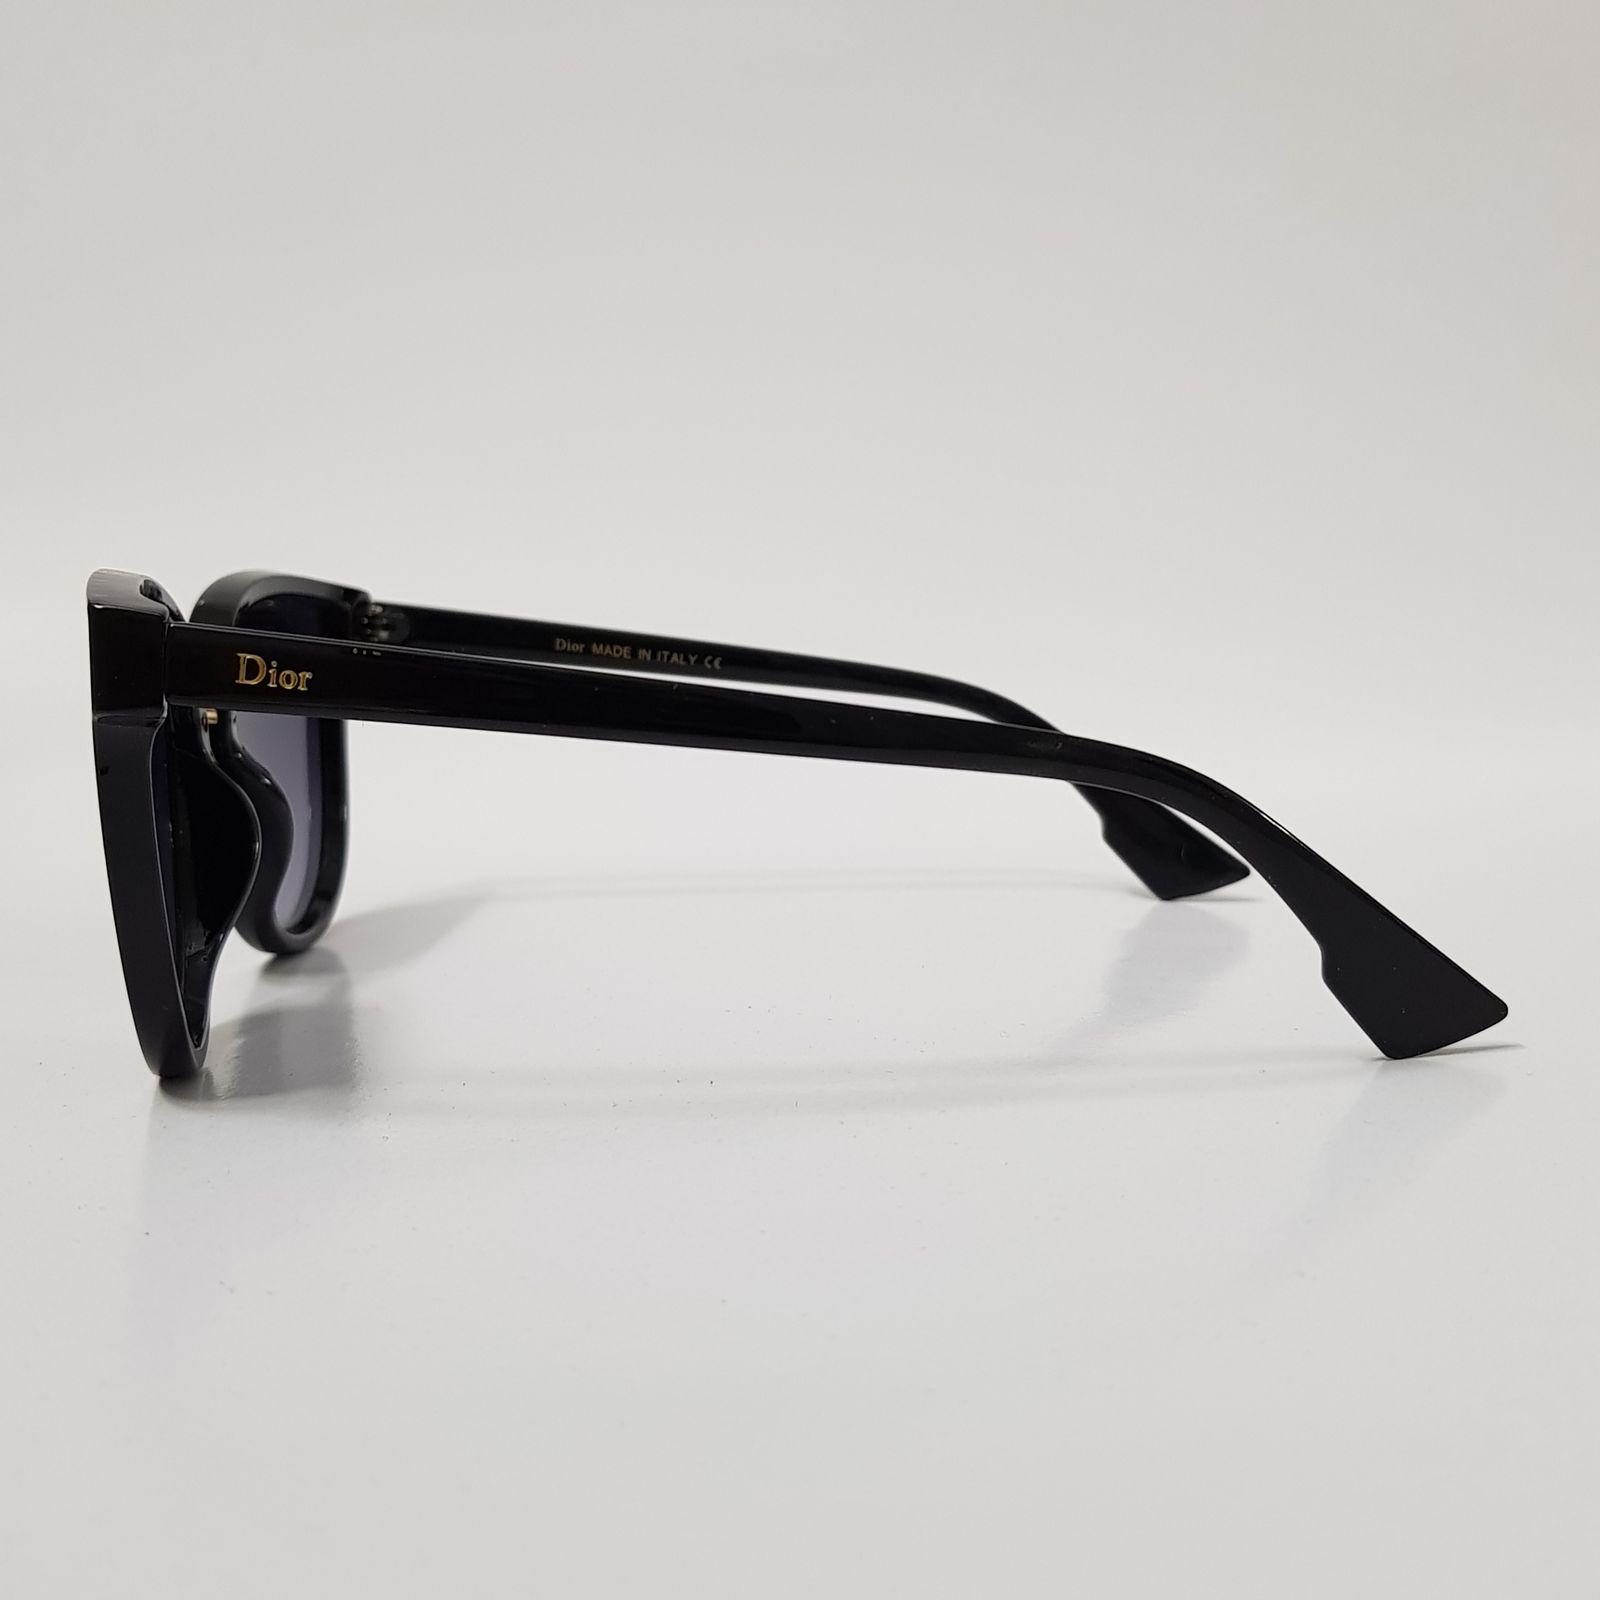 عینک آفتابی زنانه دیور کد 3030D1 main 1 4